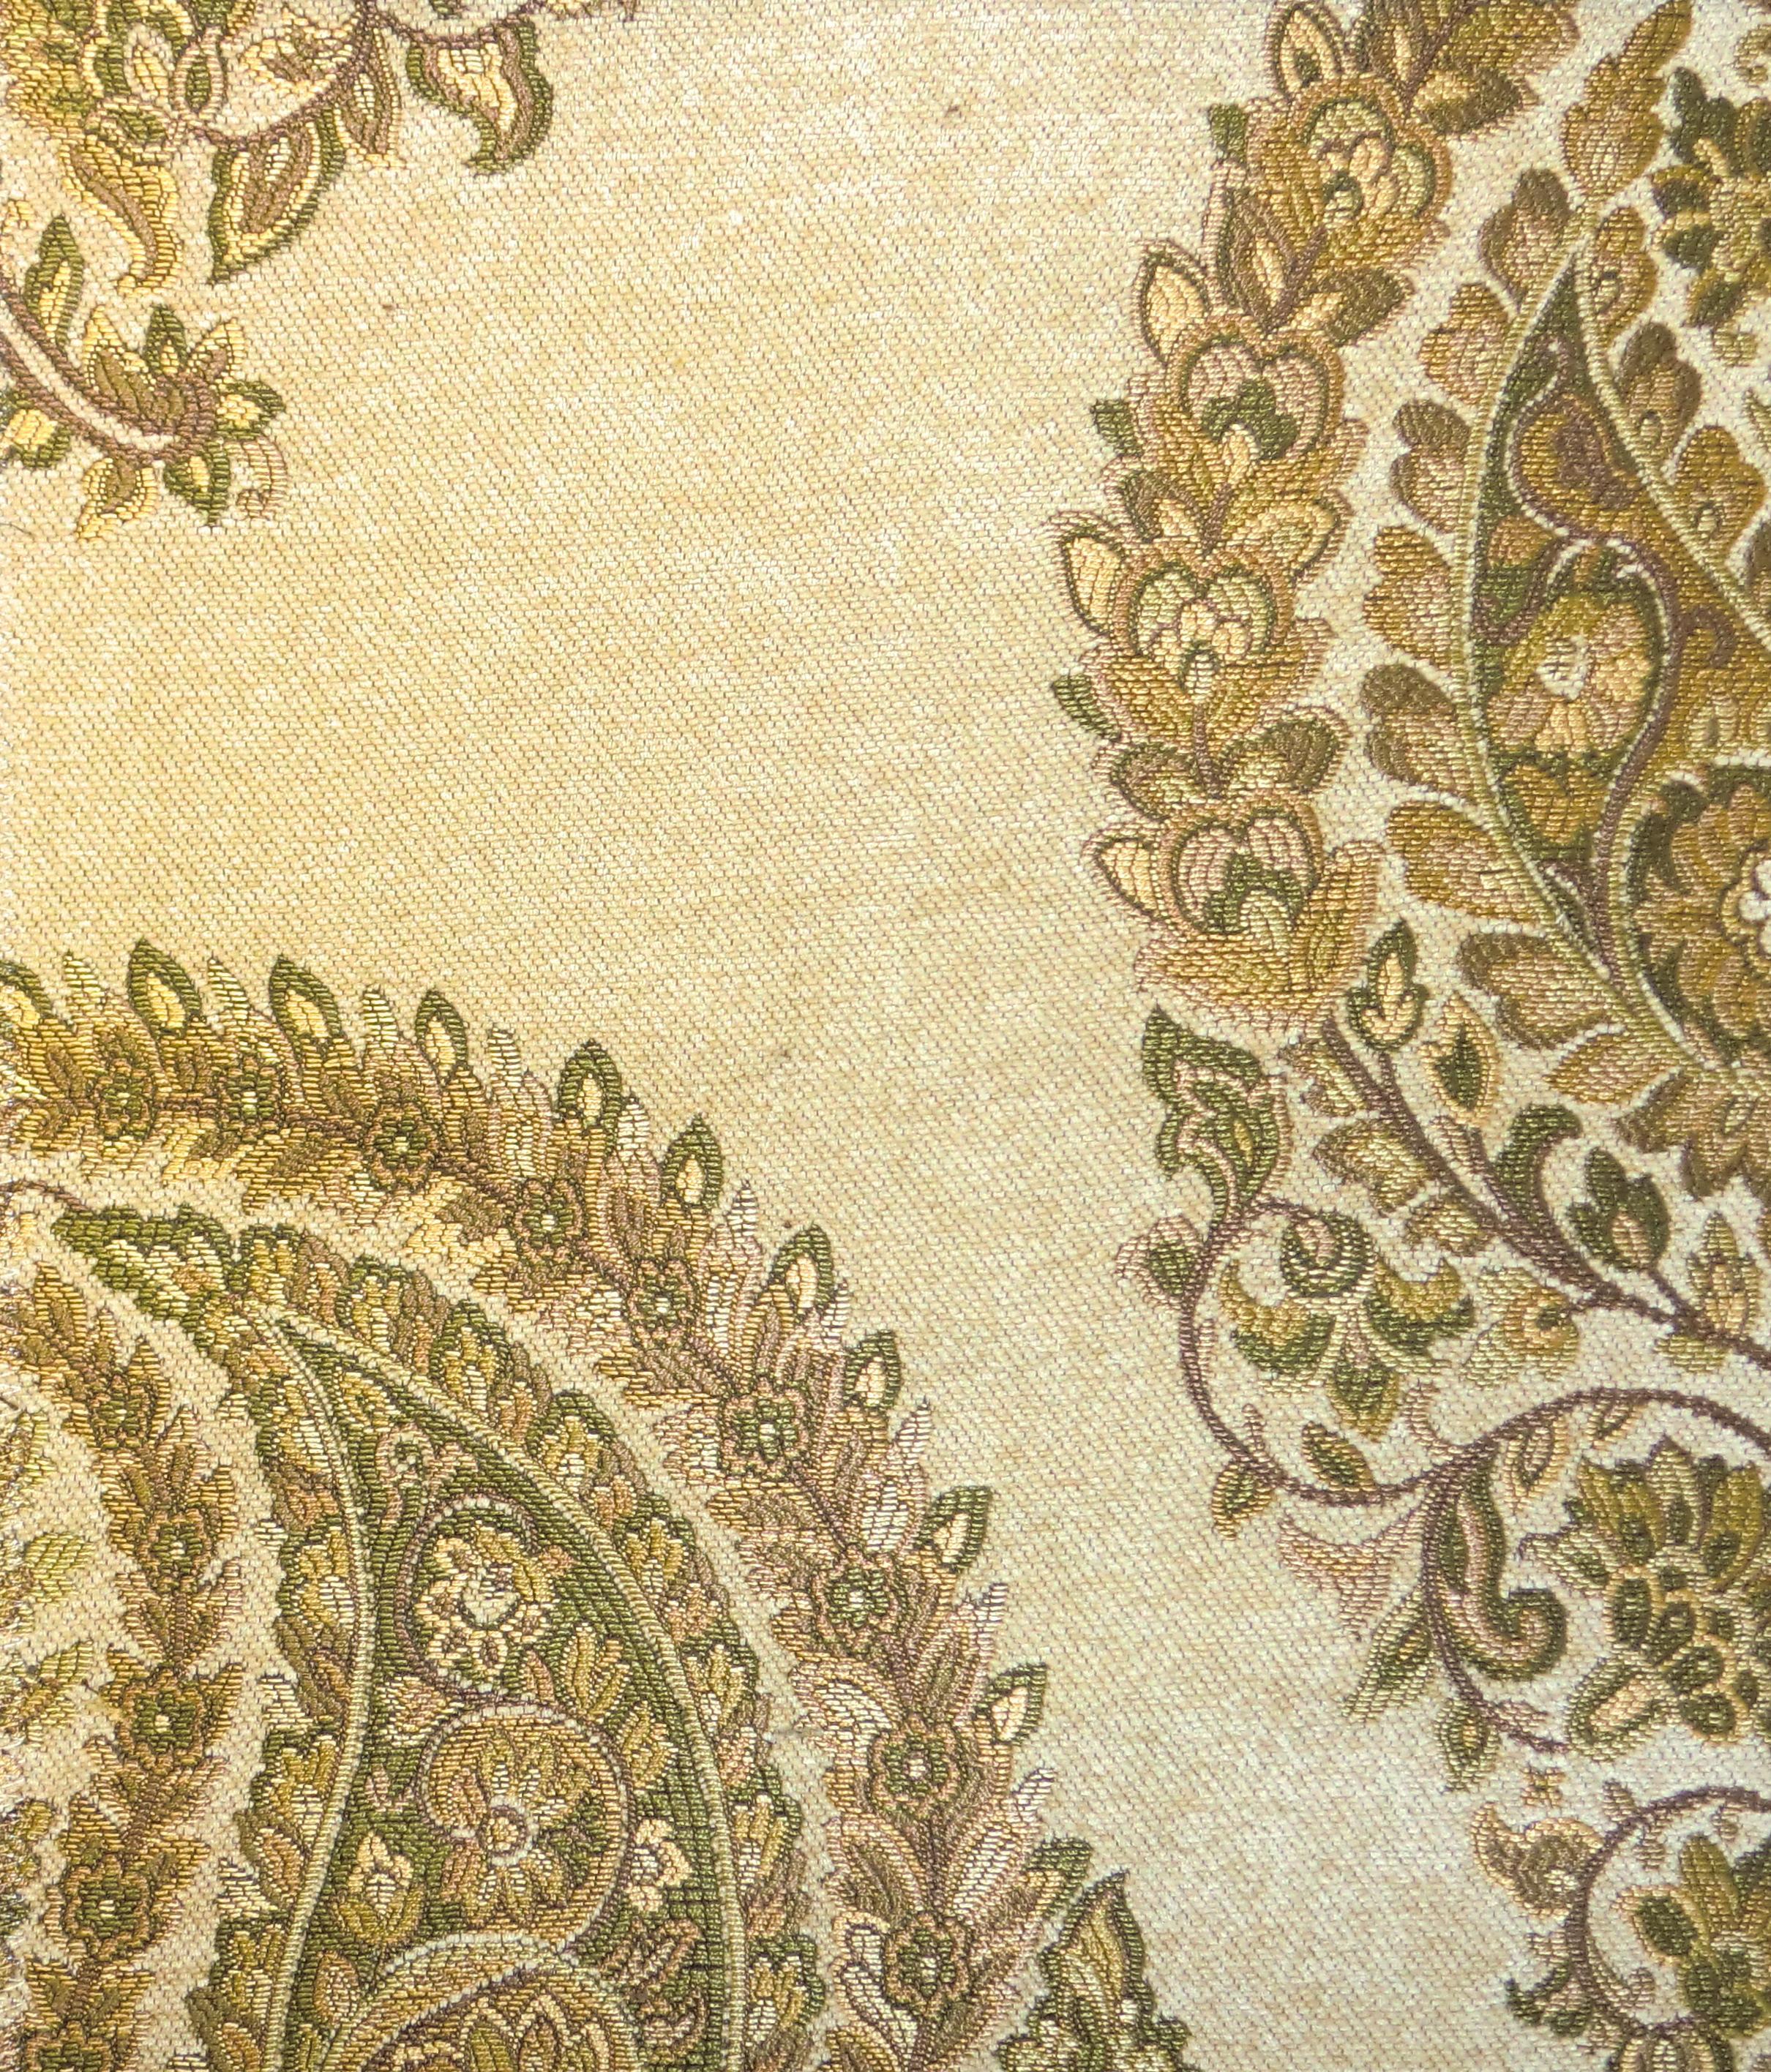 Kasmir Fabrics Pashmina Paisley Cream - InteriorDecorating.com